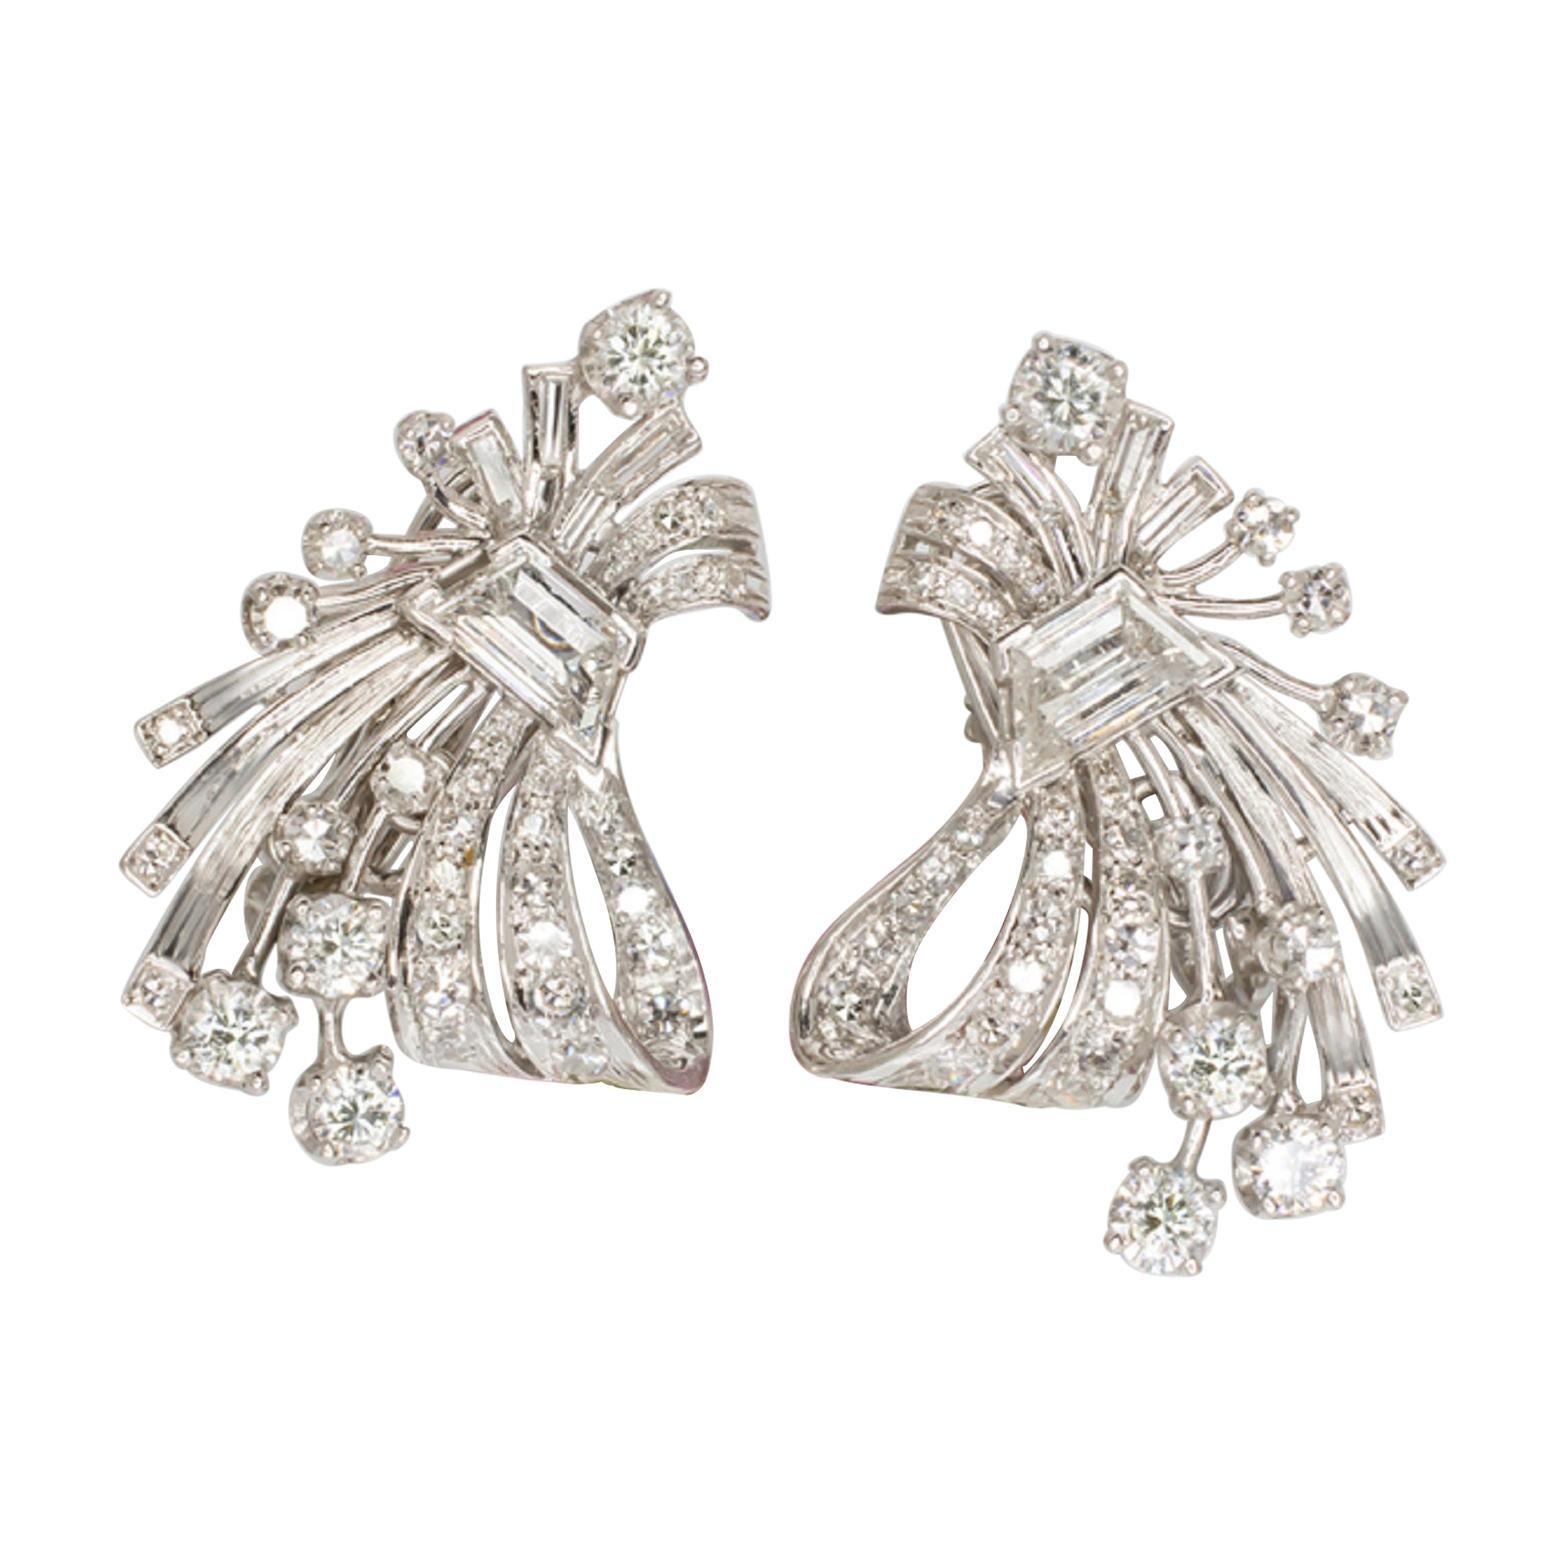 Art Deco 5 Carat Platinum White Diamond Earrings F VS Clarity